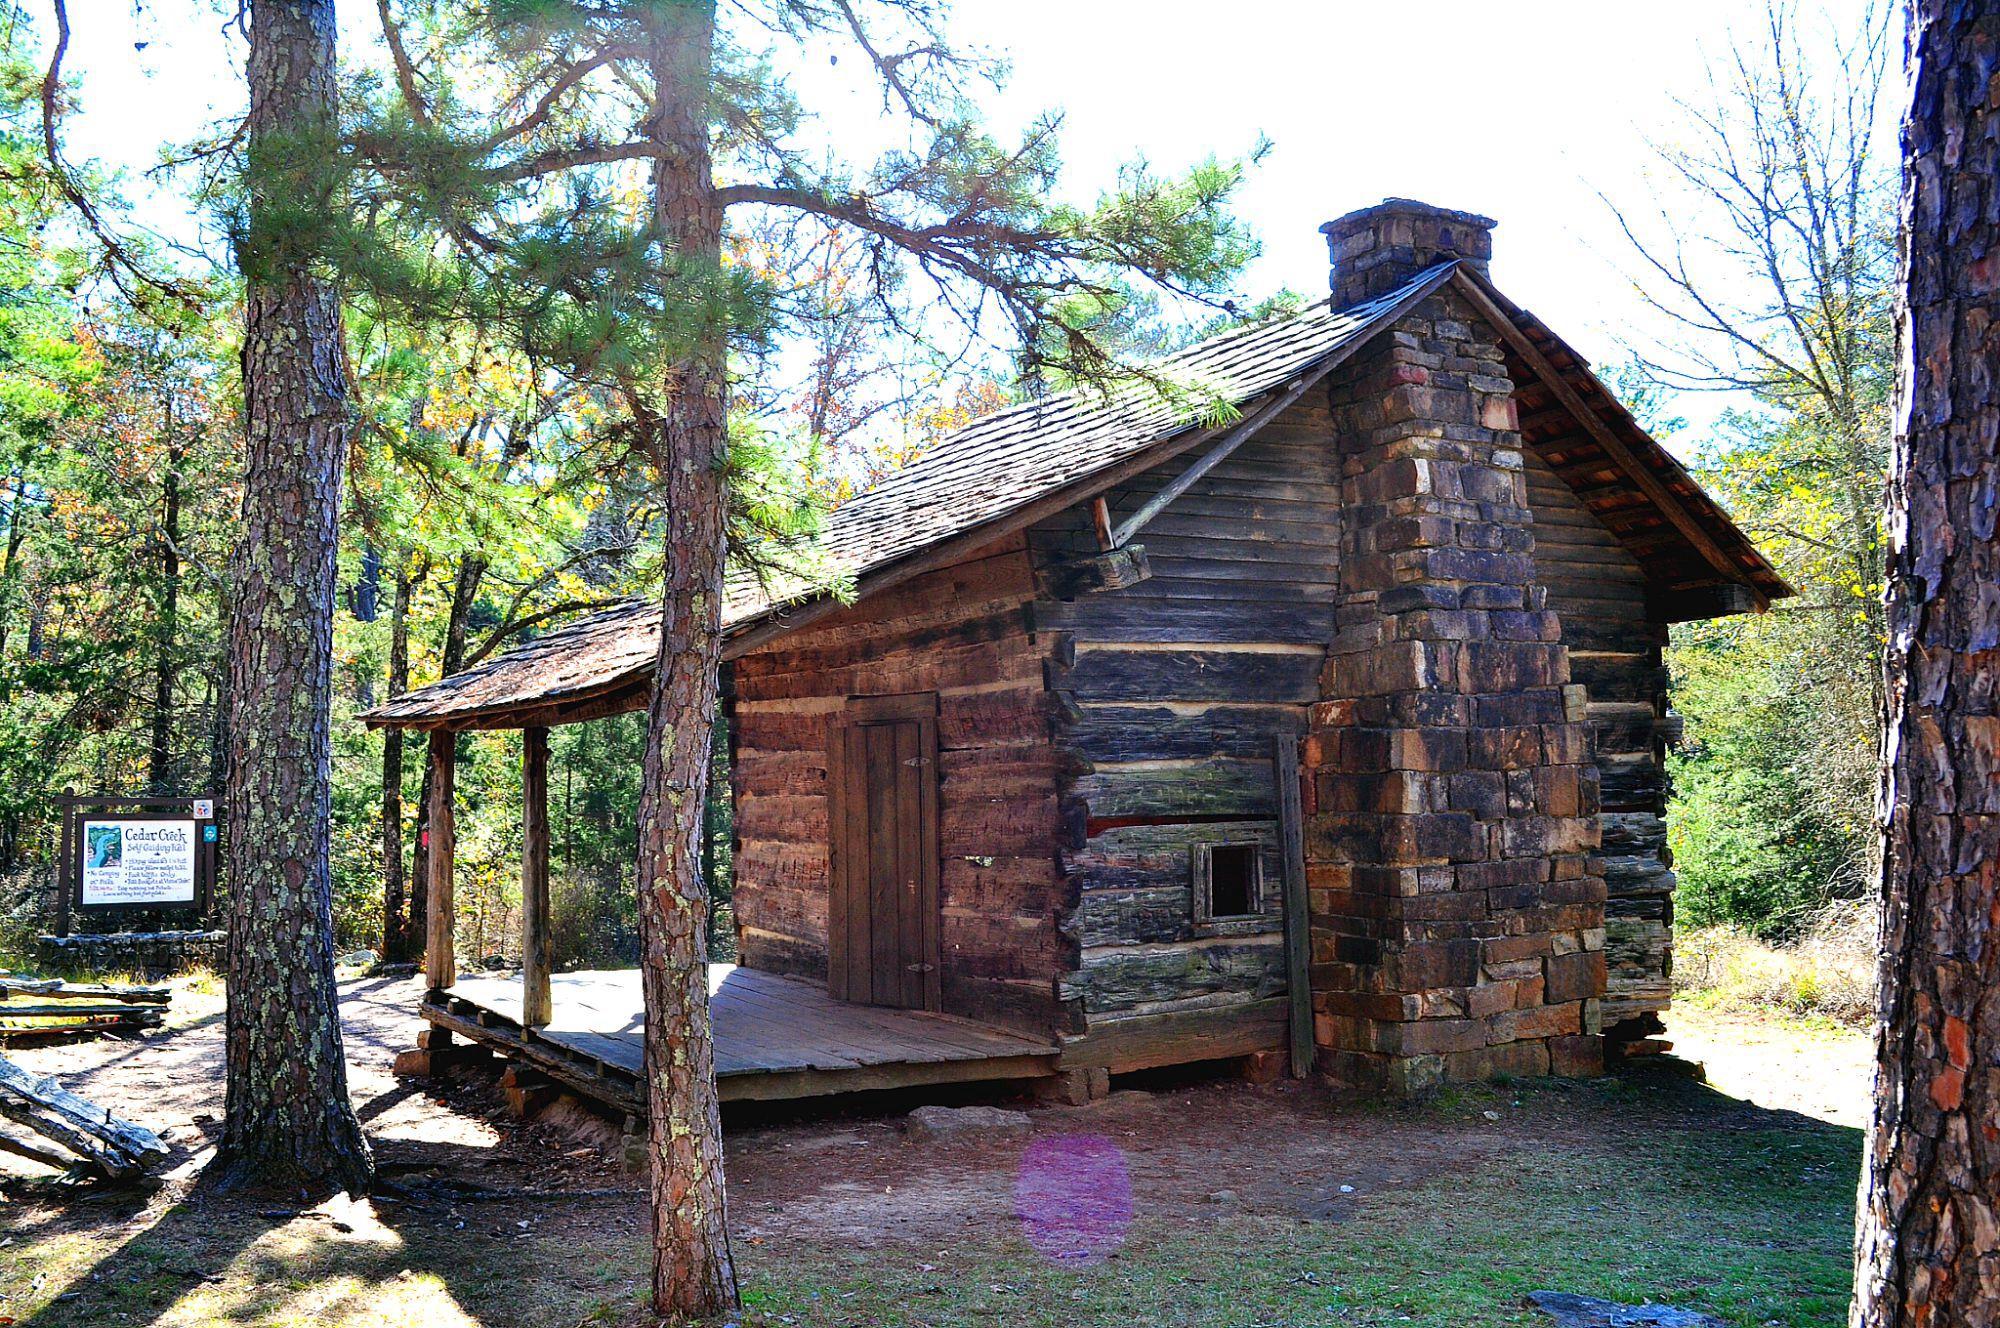 John walker cabin 1845 petit jean mt arkansas cabins treehouses lake houses - Maison en bois montana cutler ...